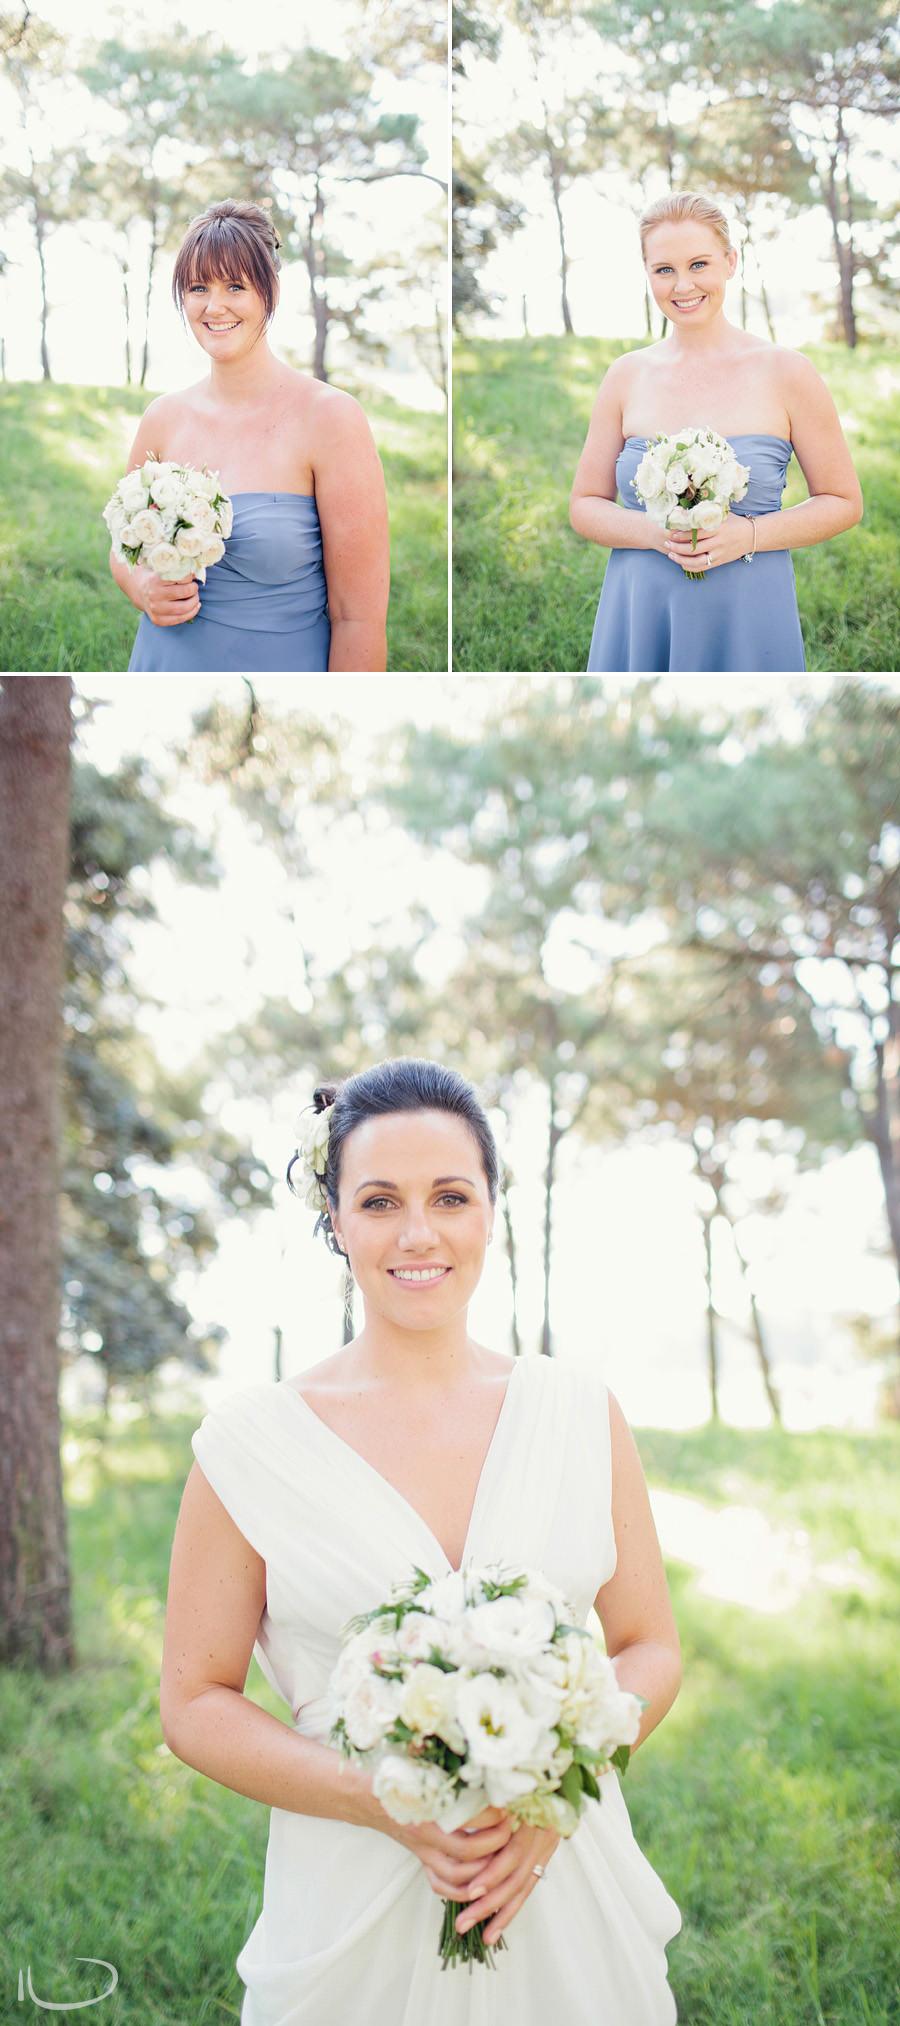 Centennial Park Wedding Photographers: Bride & Bridesmaids